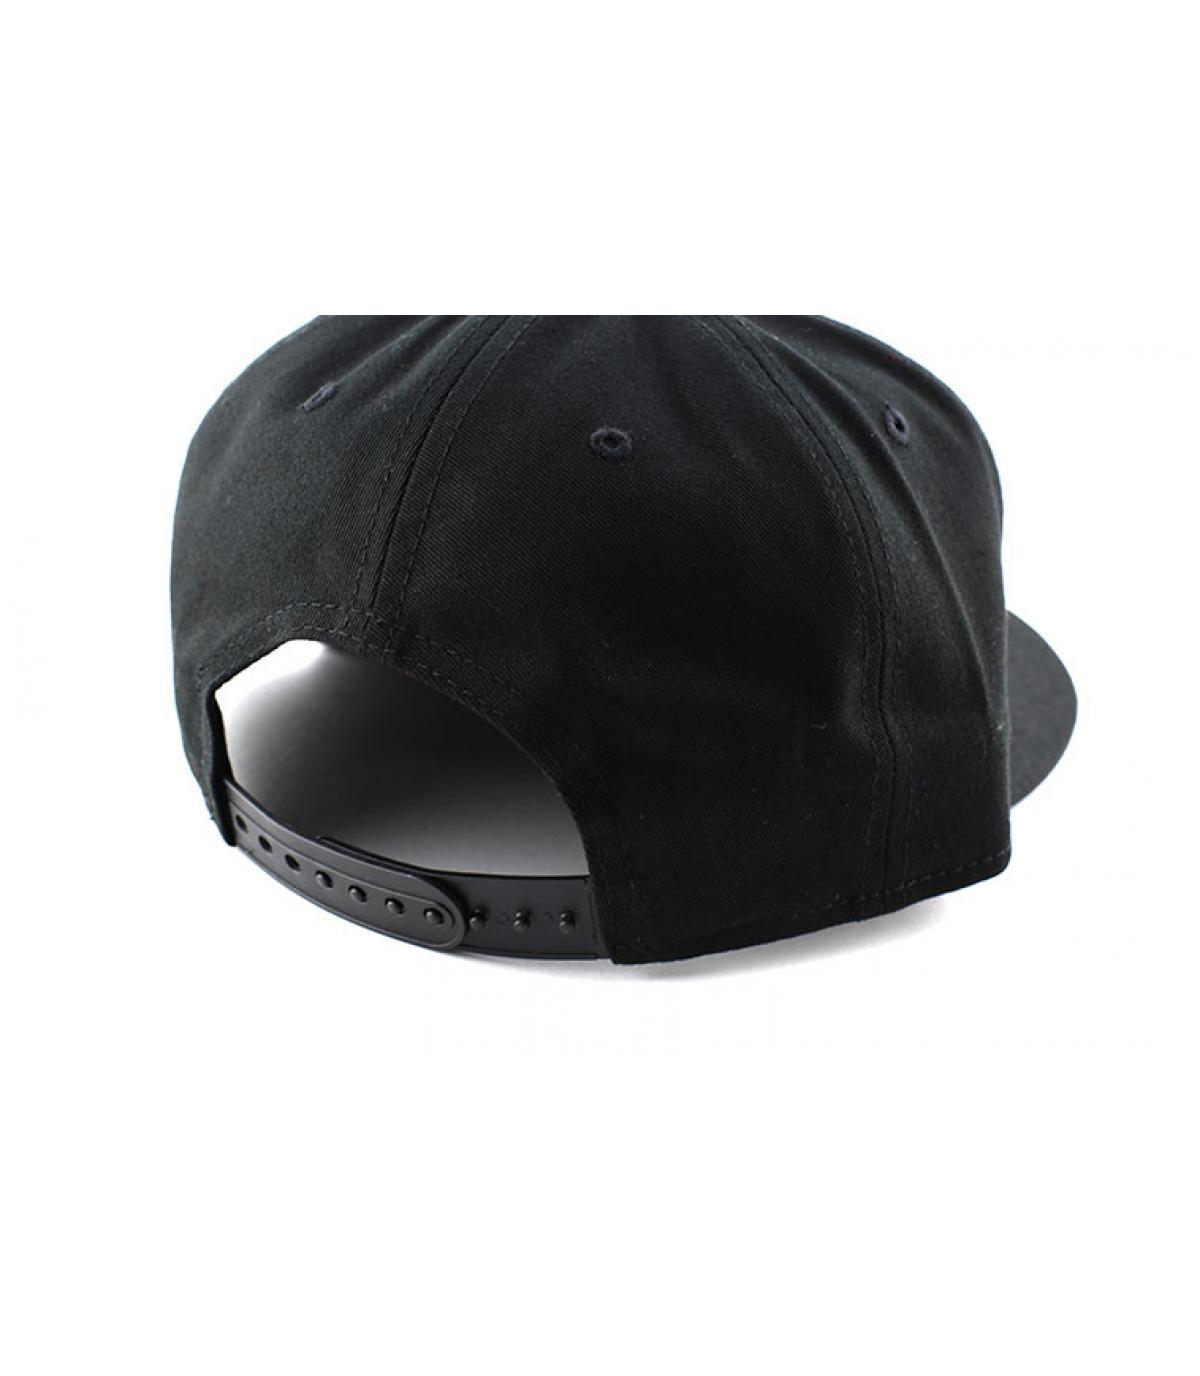 Details Snapback Cap NY MLB black black - Abbildung 5